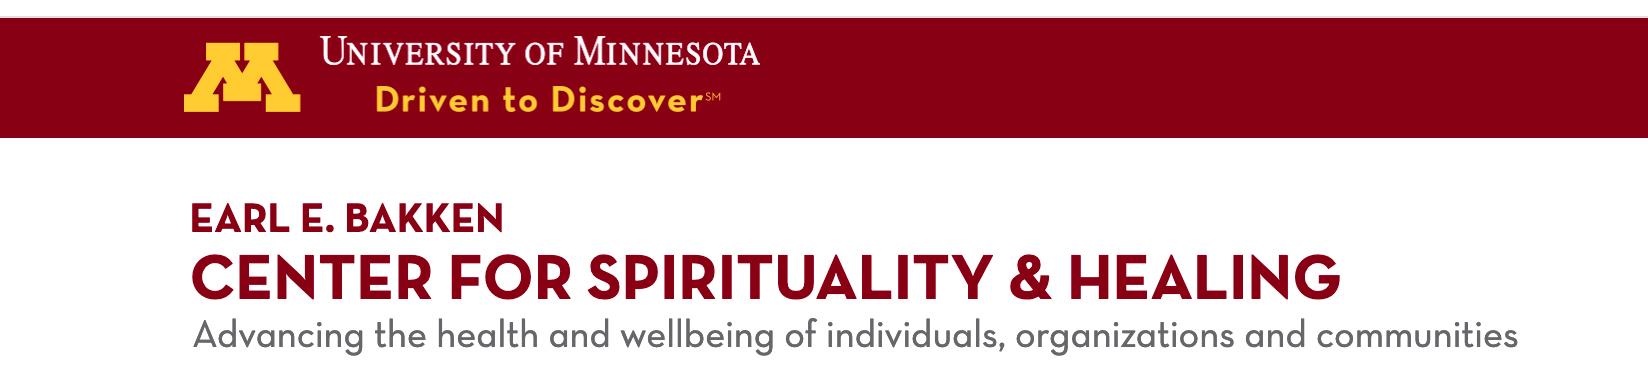 nw-center-spirituality.jpg